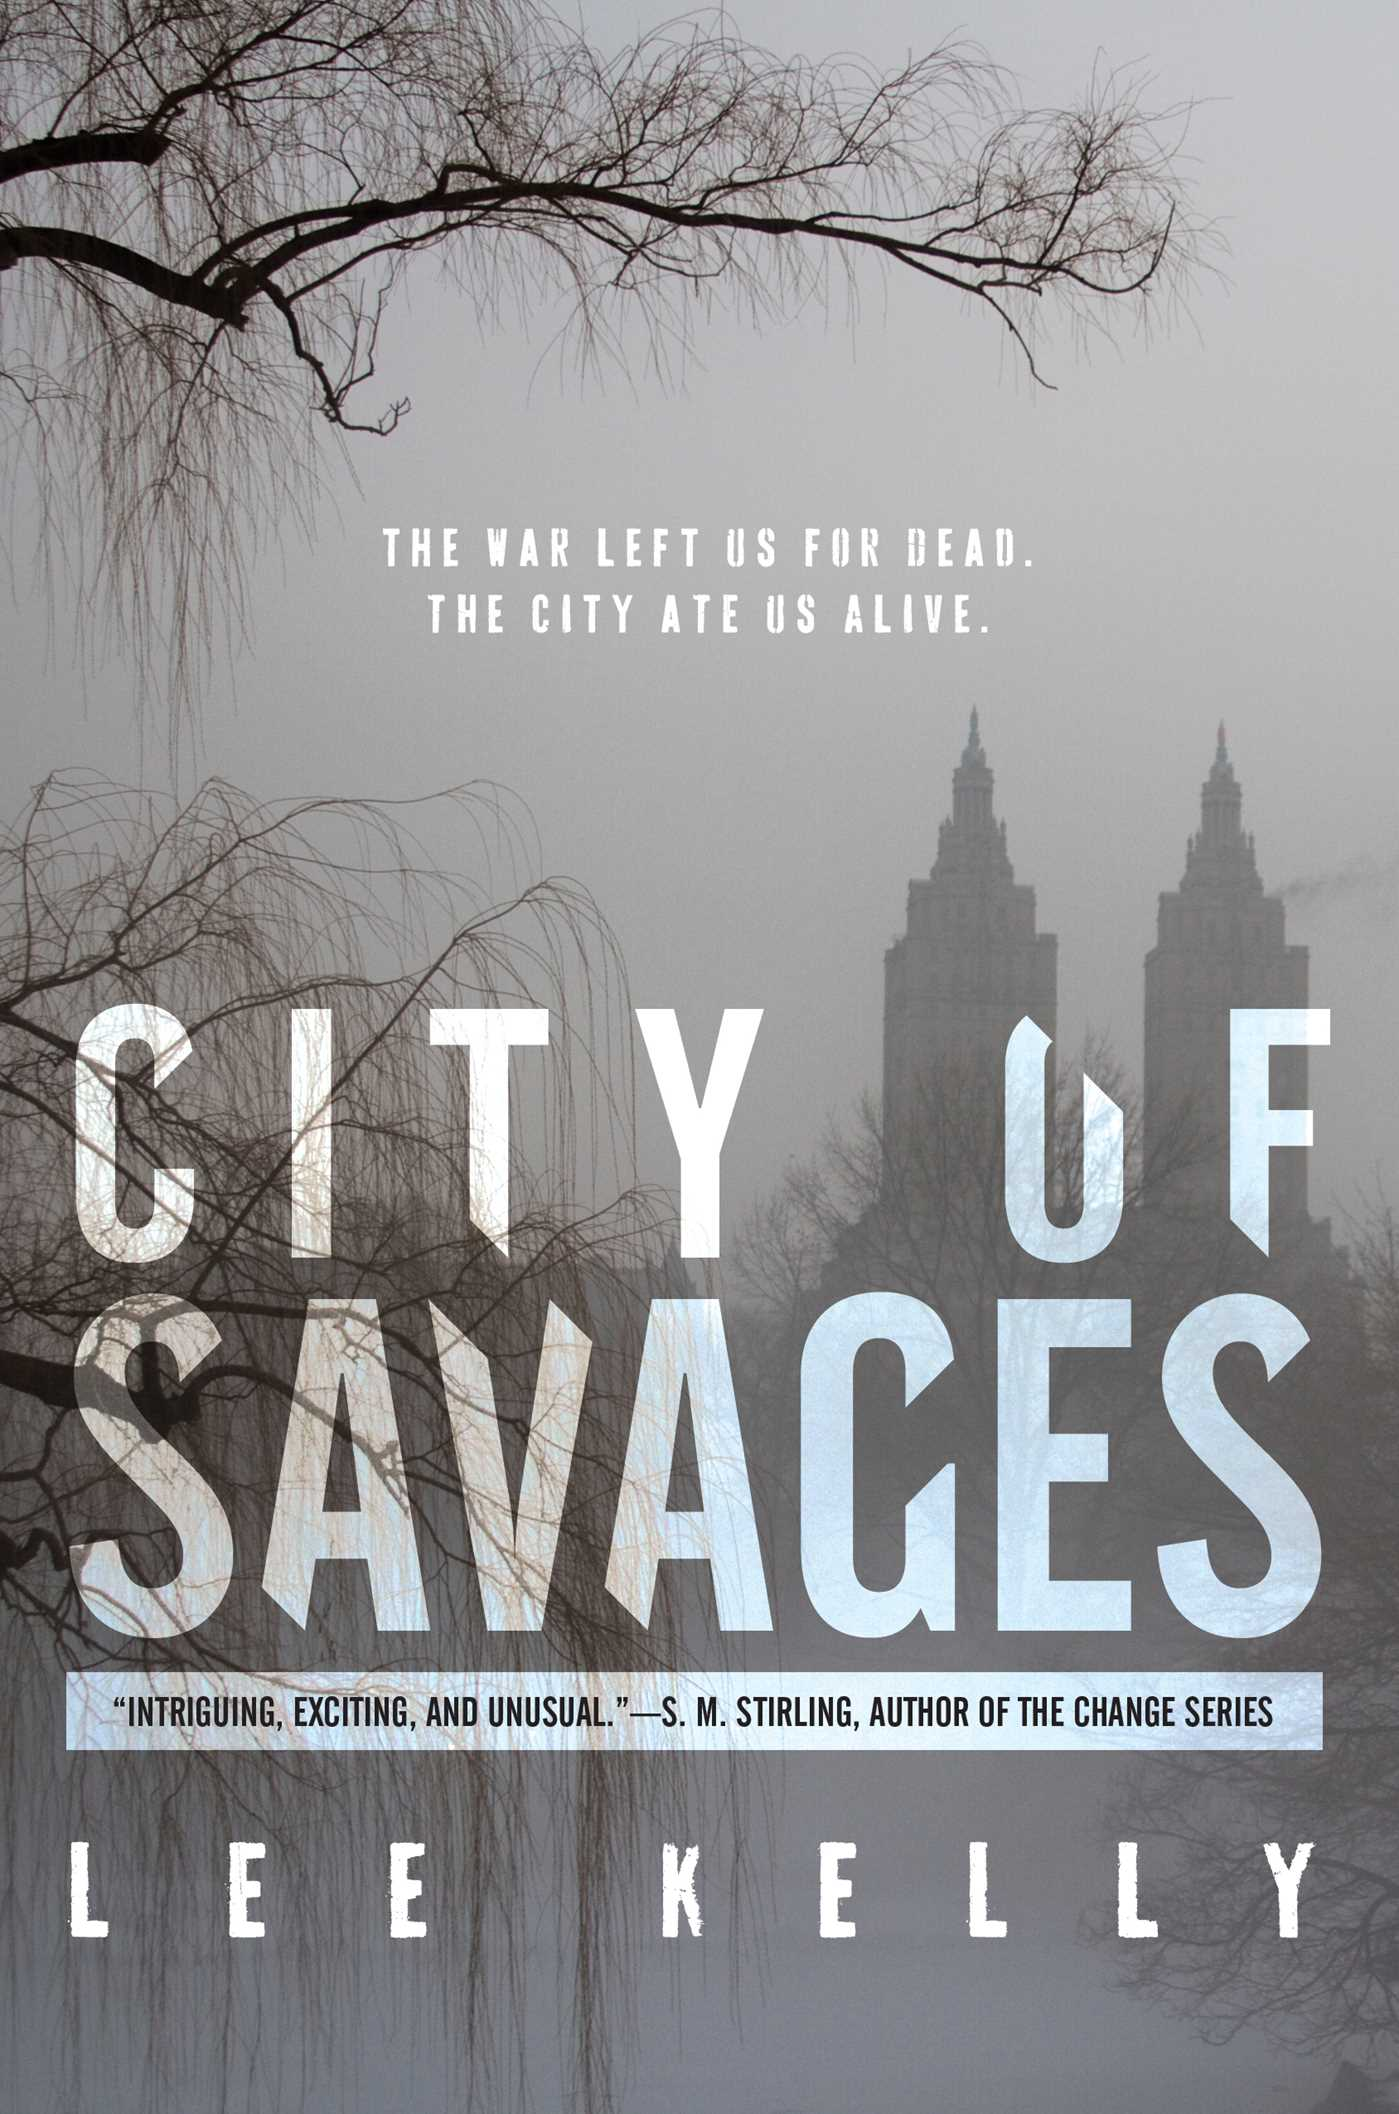 City of savages 9781481410304 hr